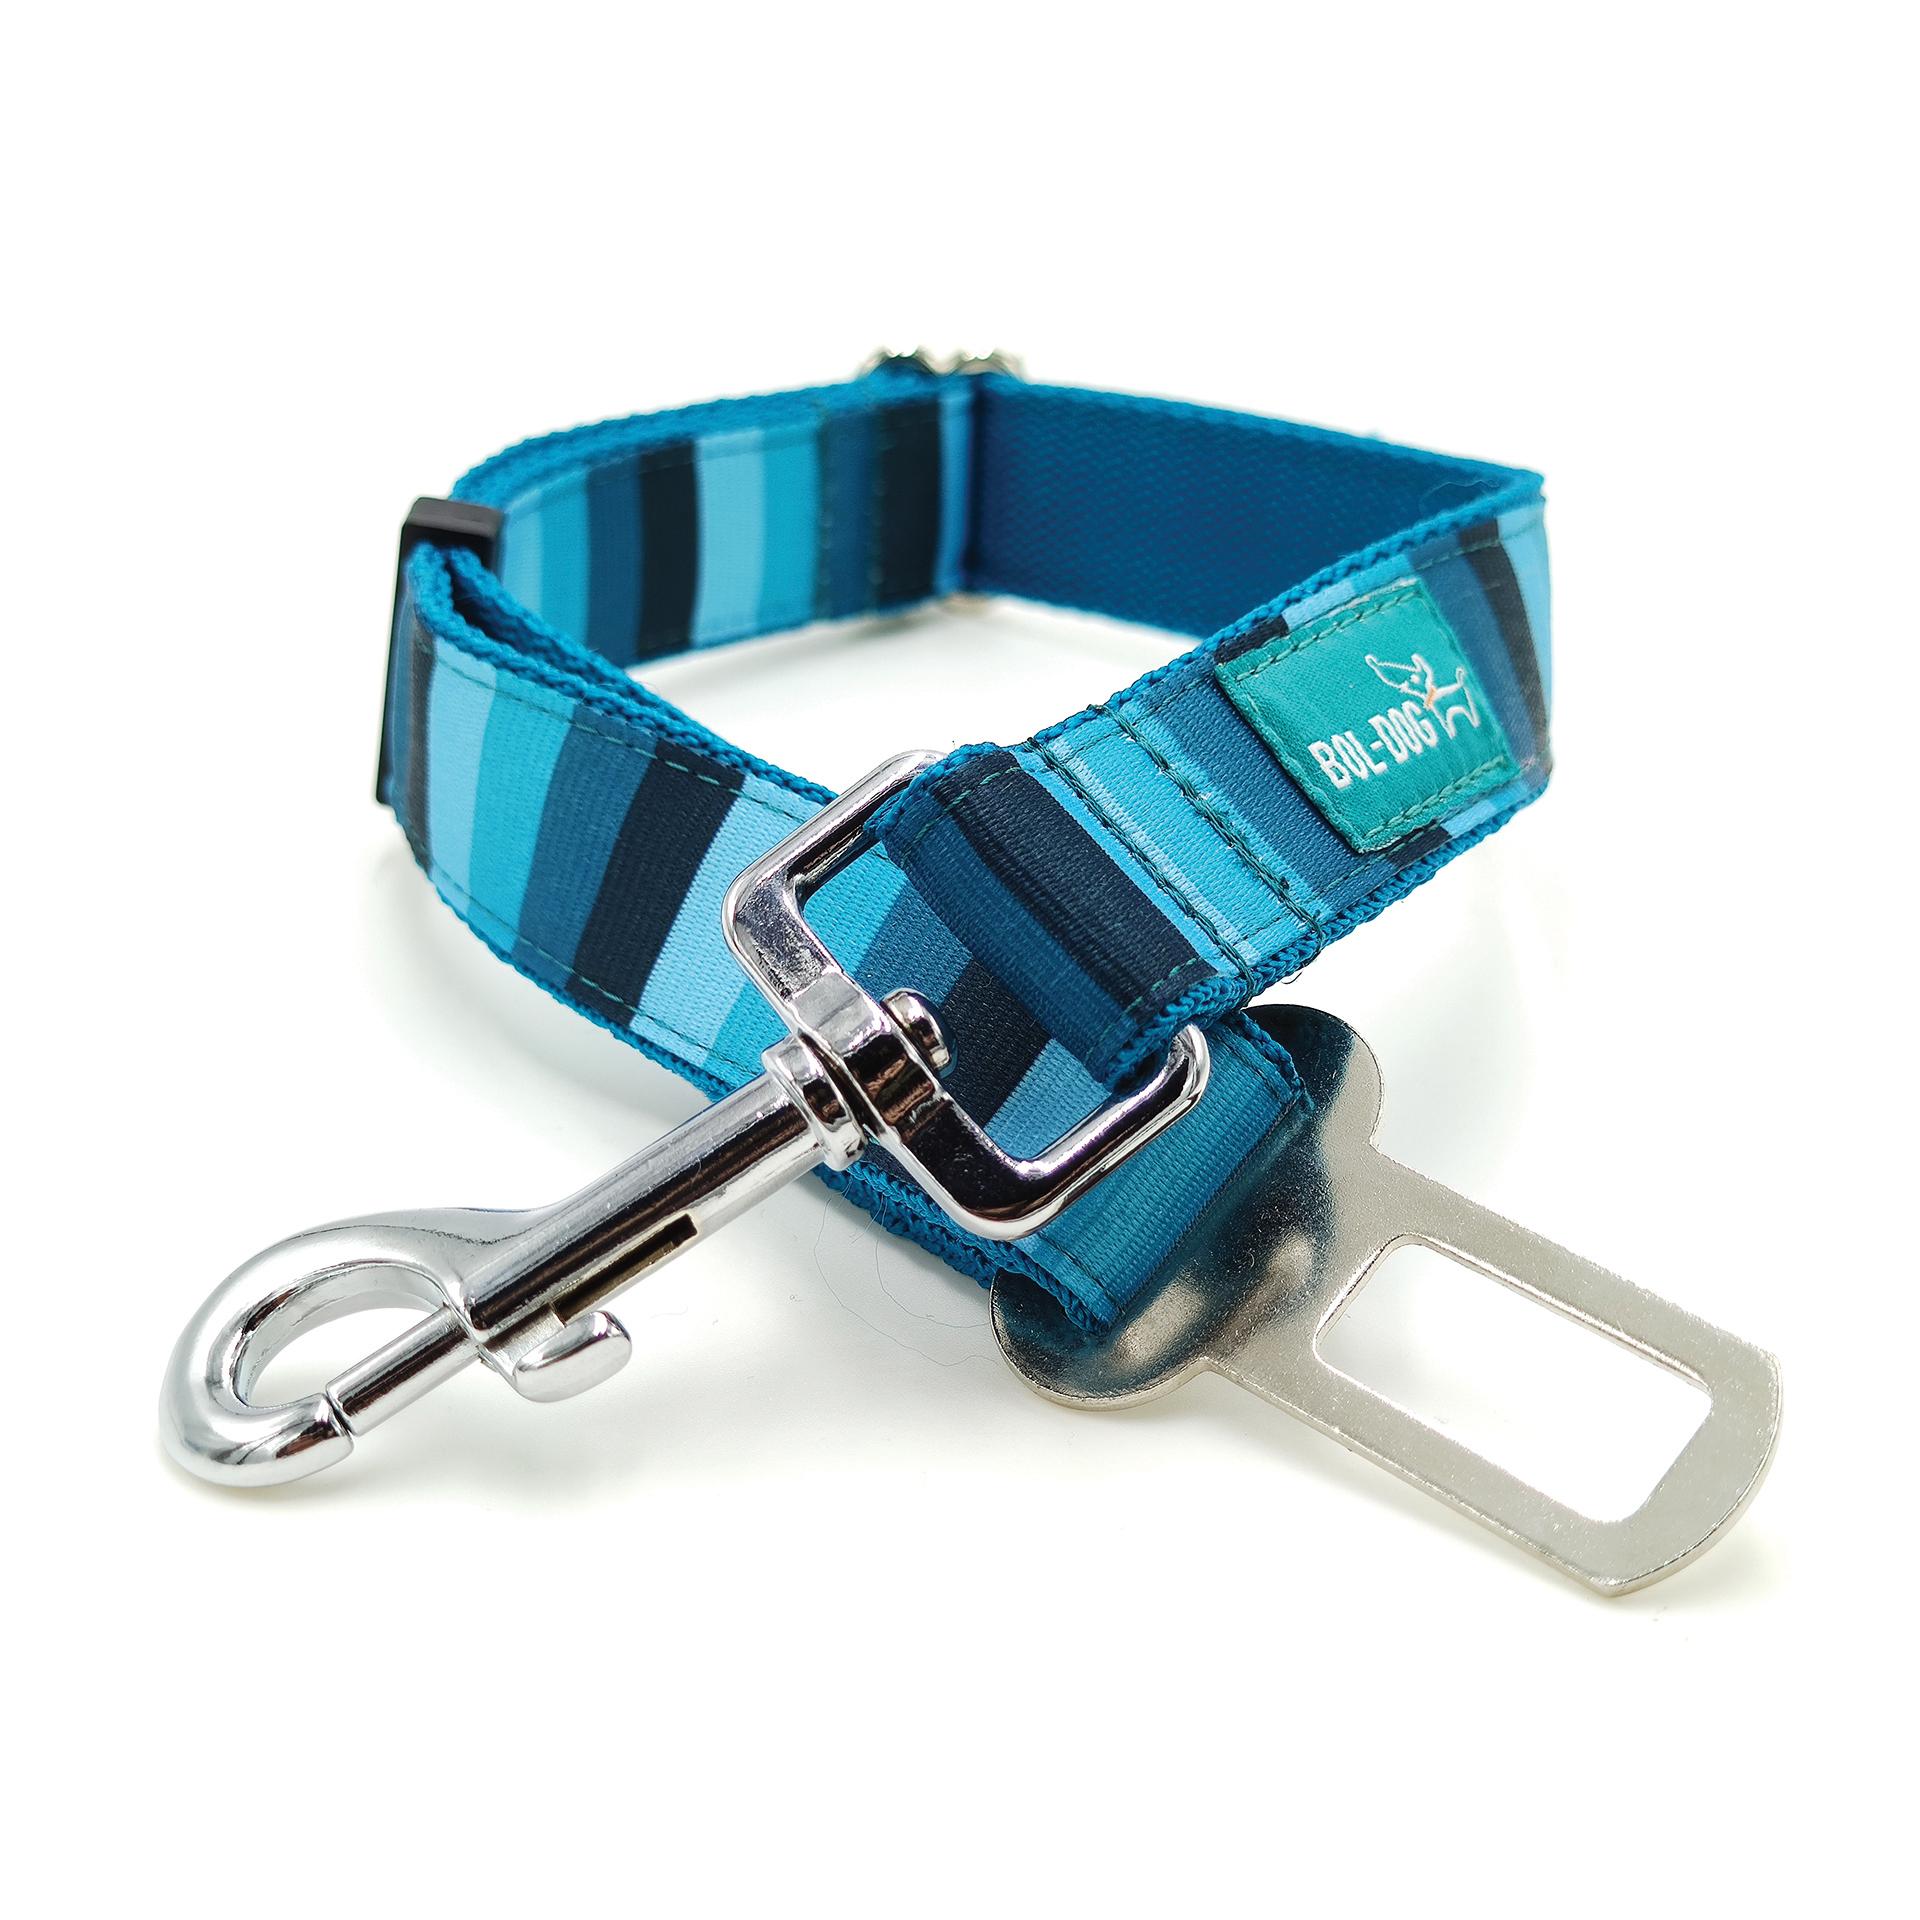 Blue striped safety belt